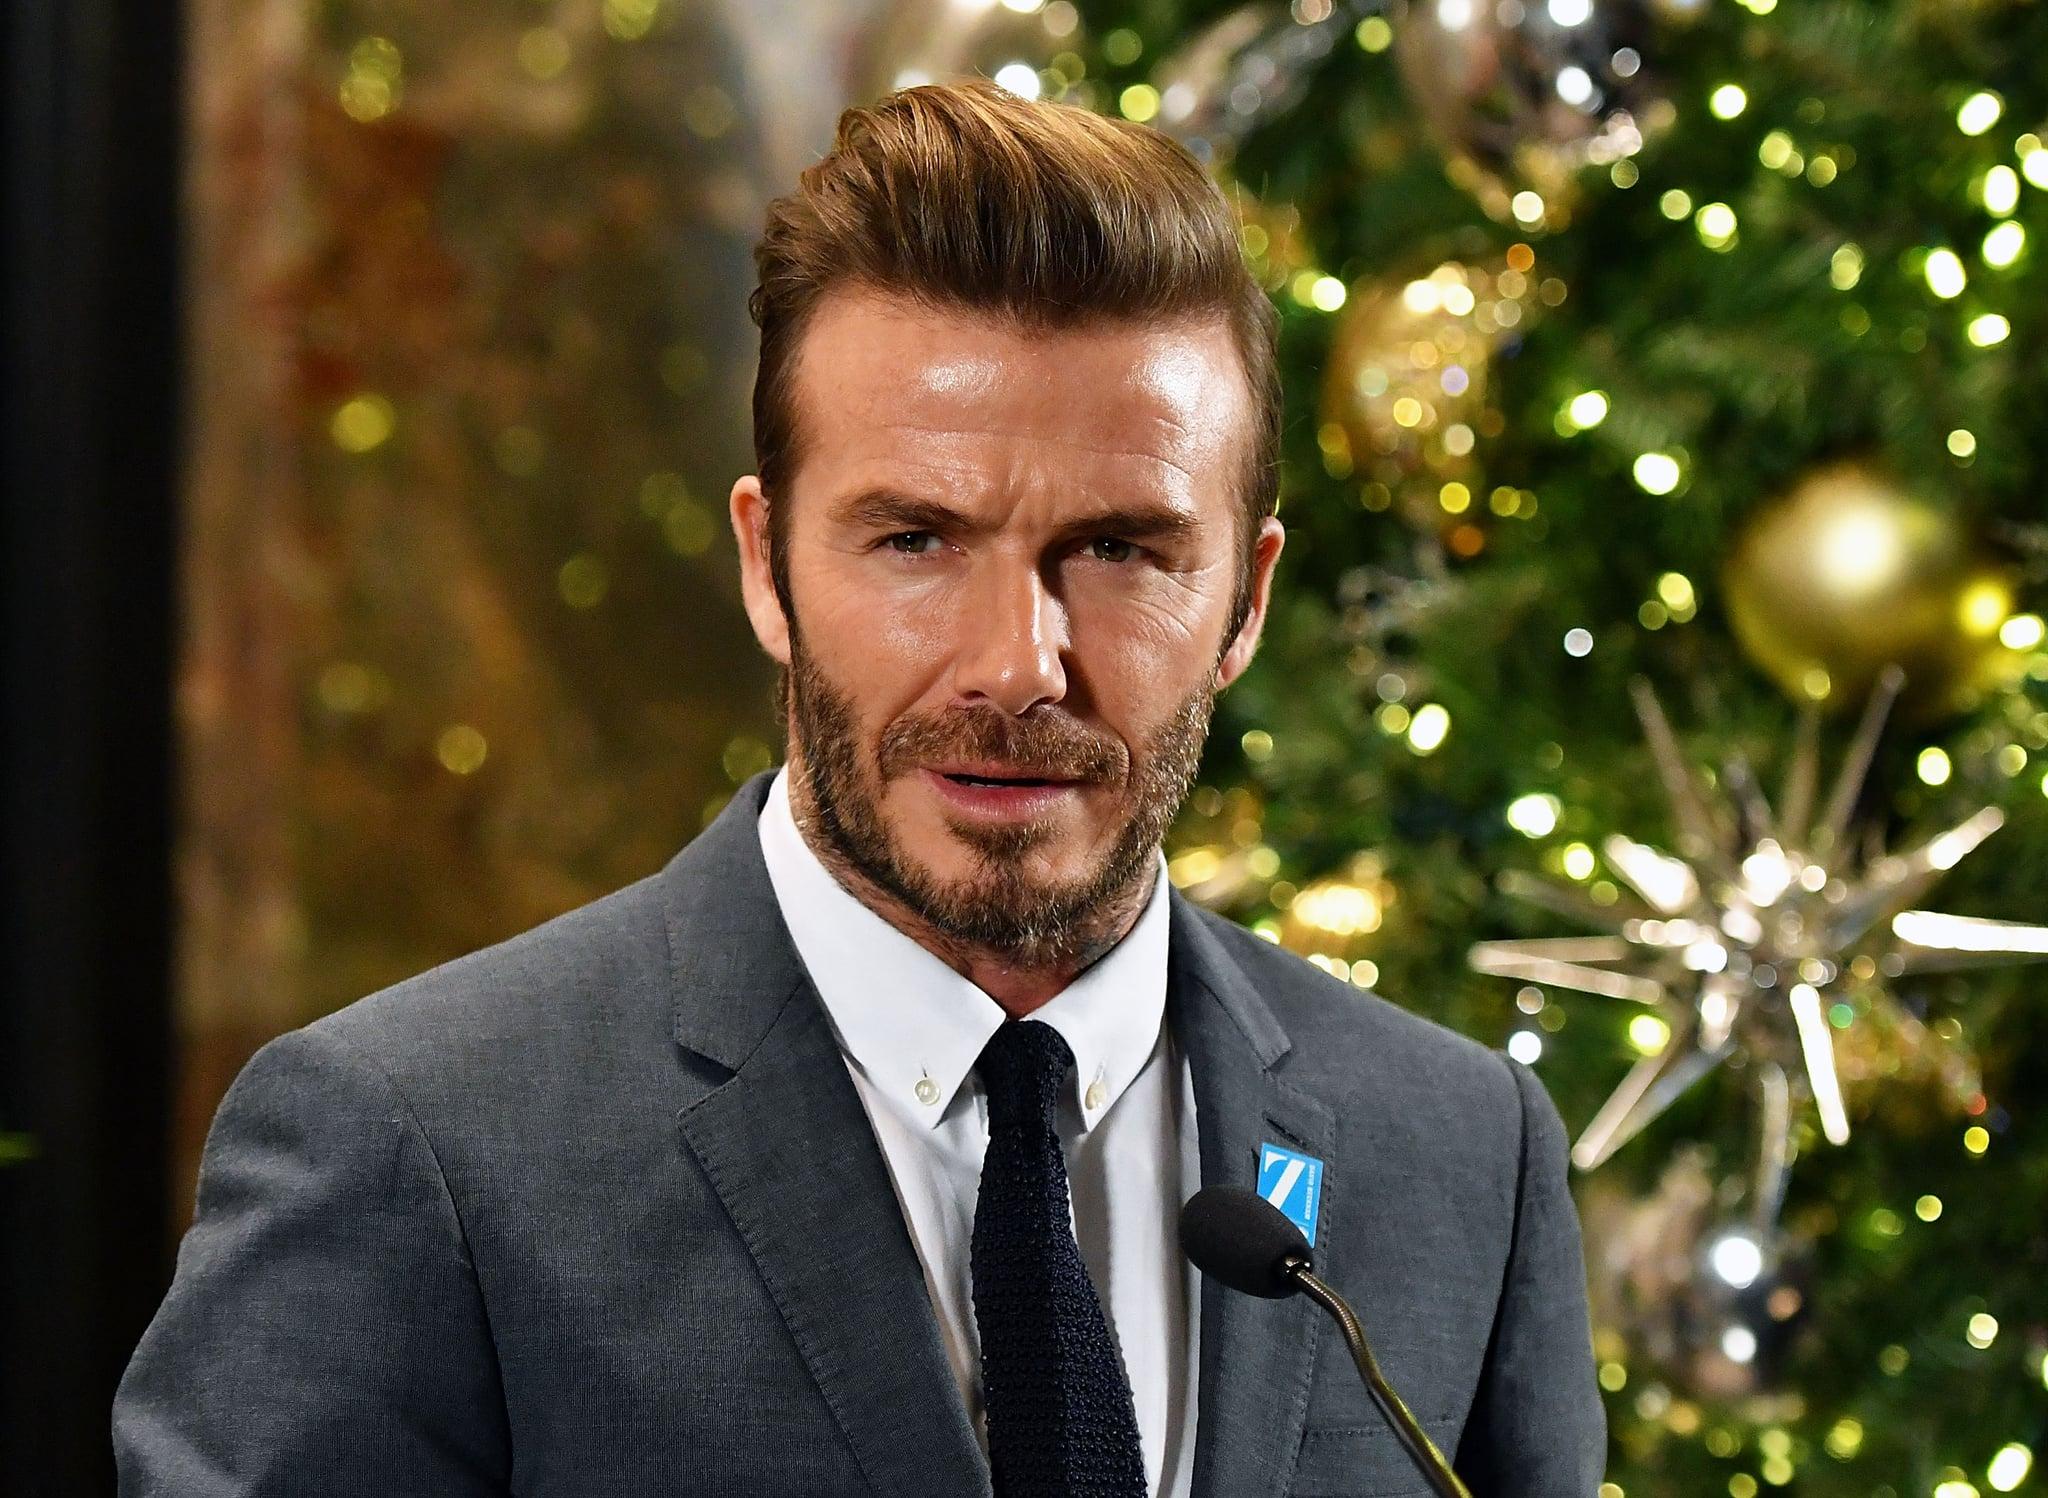 David Beckham Lights The Empire State Building Dec 16 Popsugar Celebrity